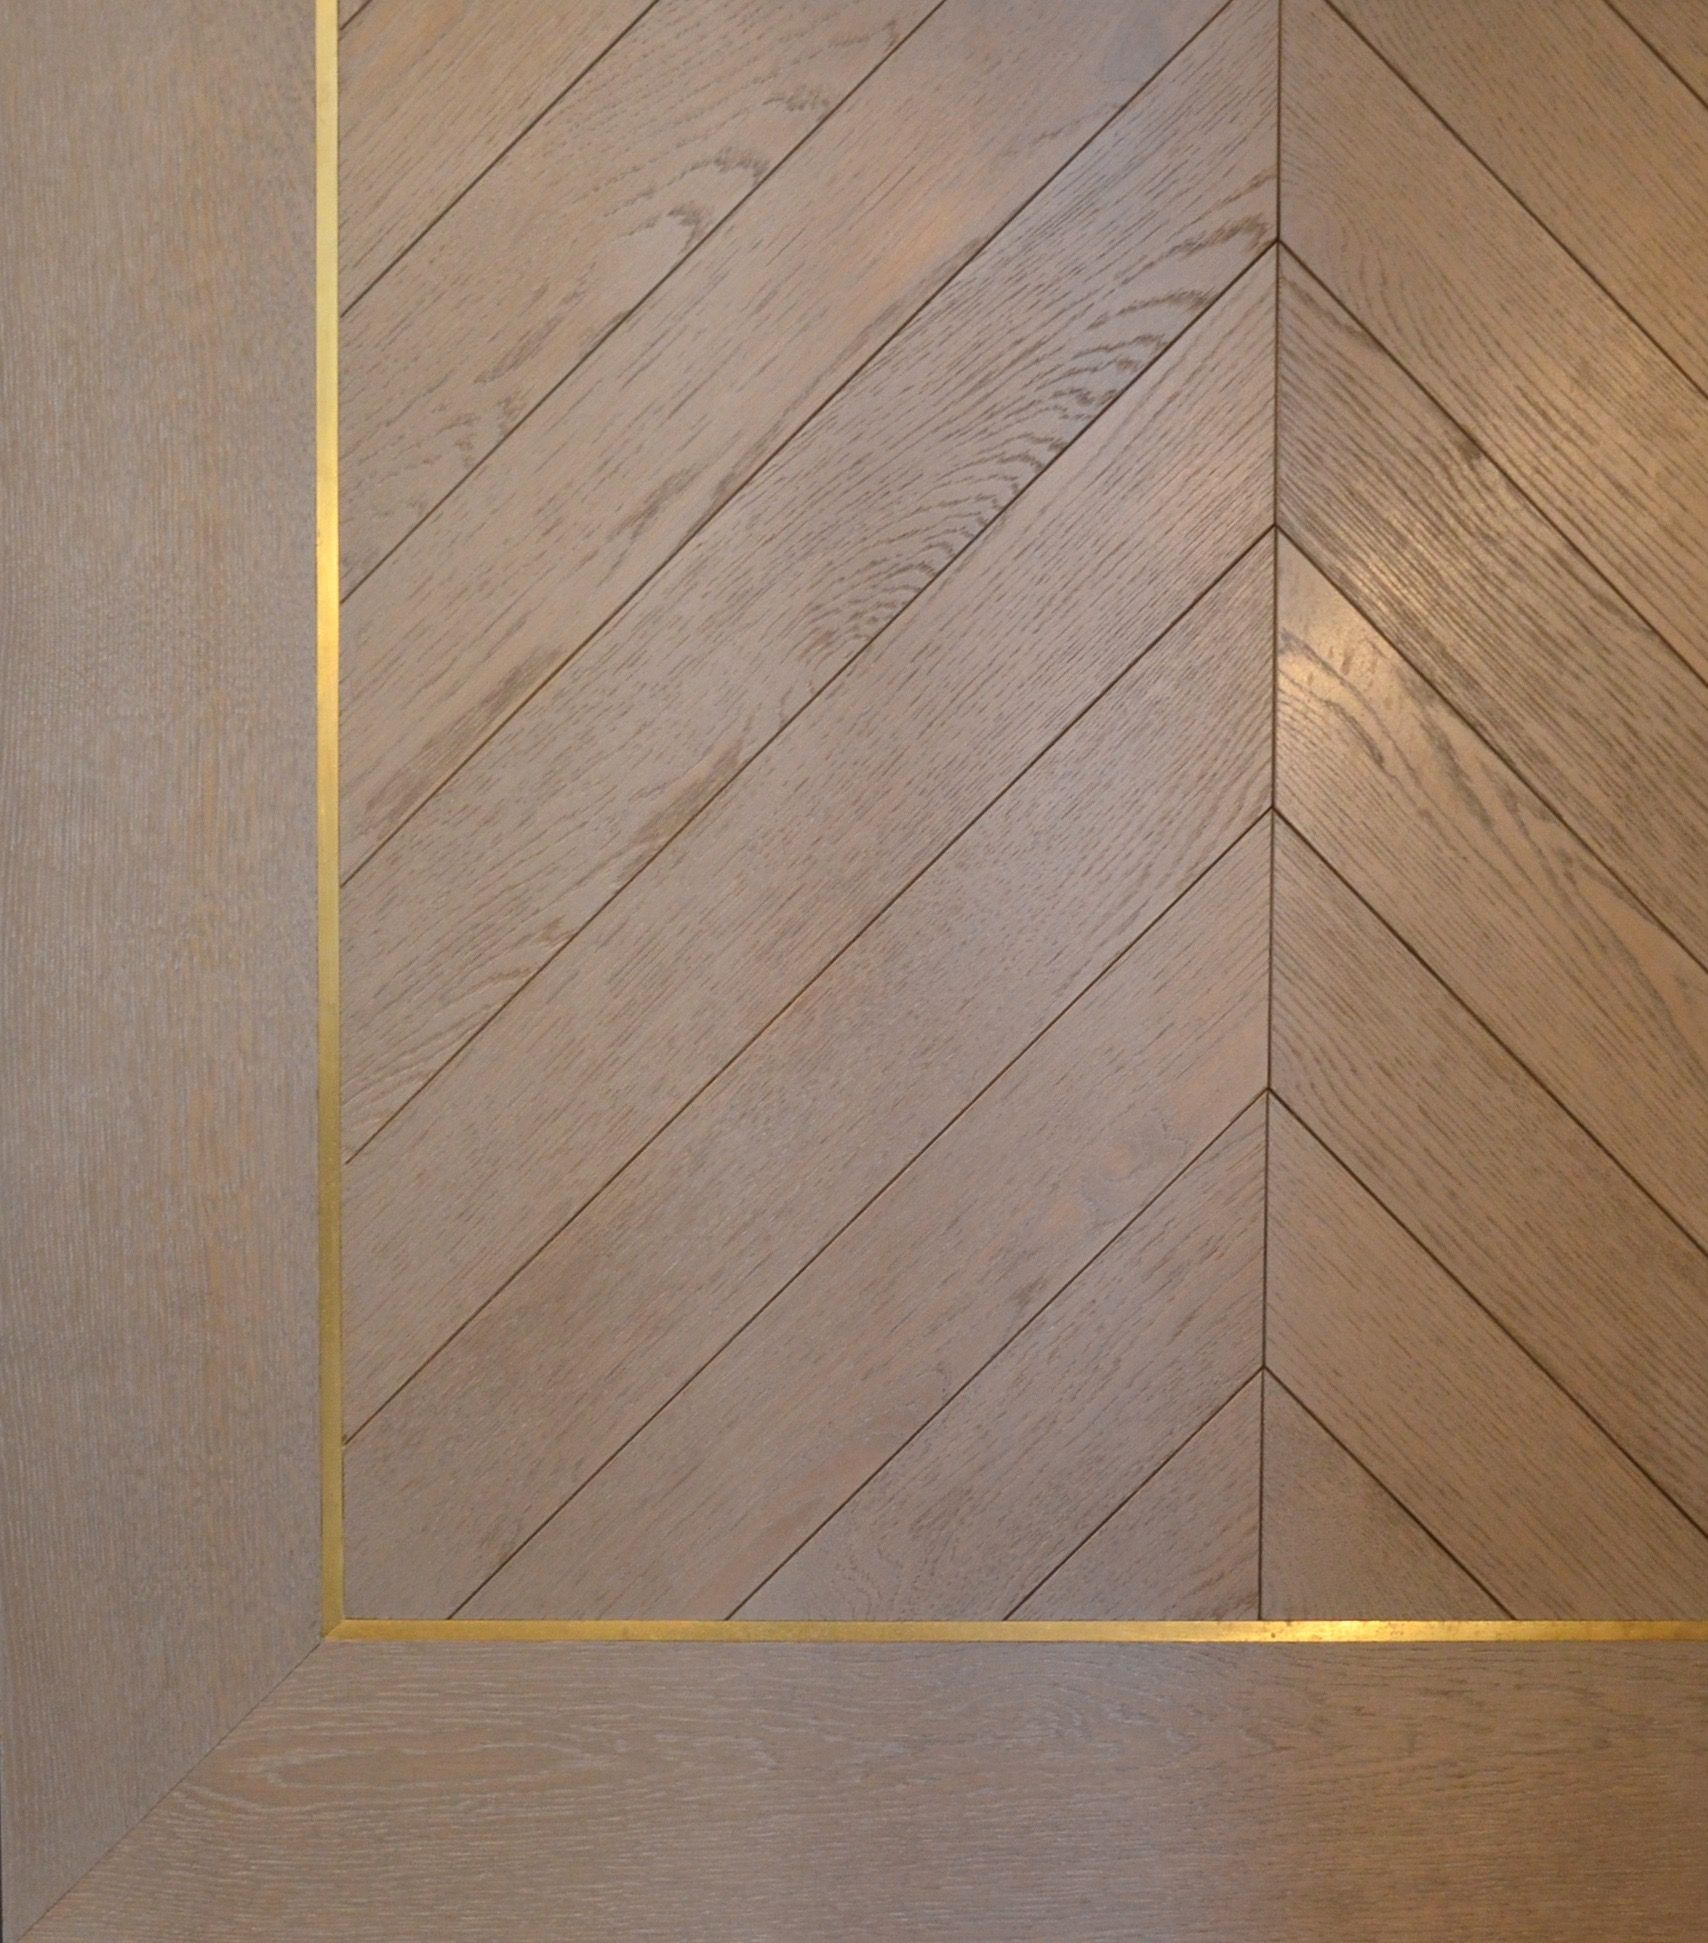 Oak Chevron With Brass Inlay Border Pattern Pinterest Floor